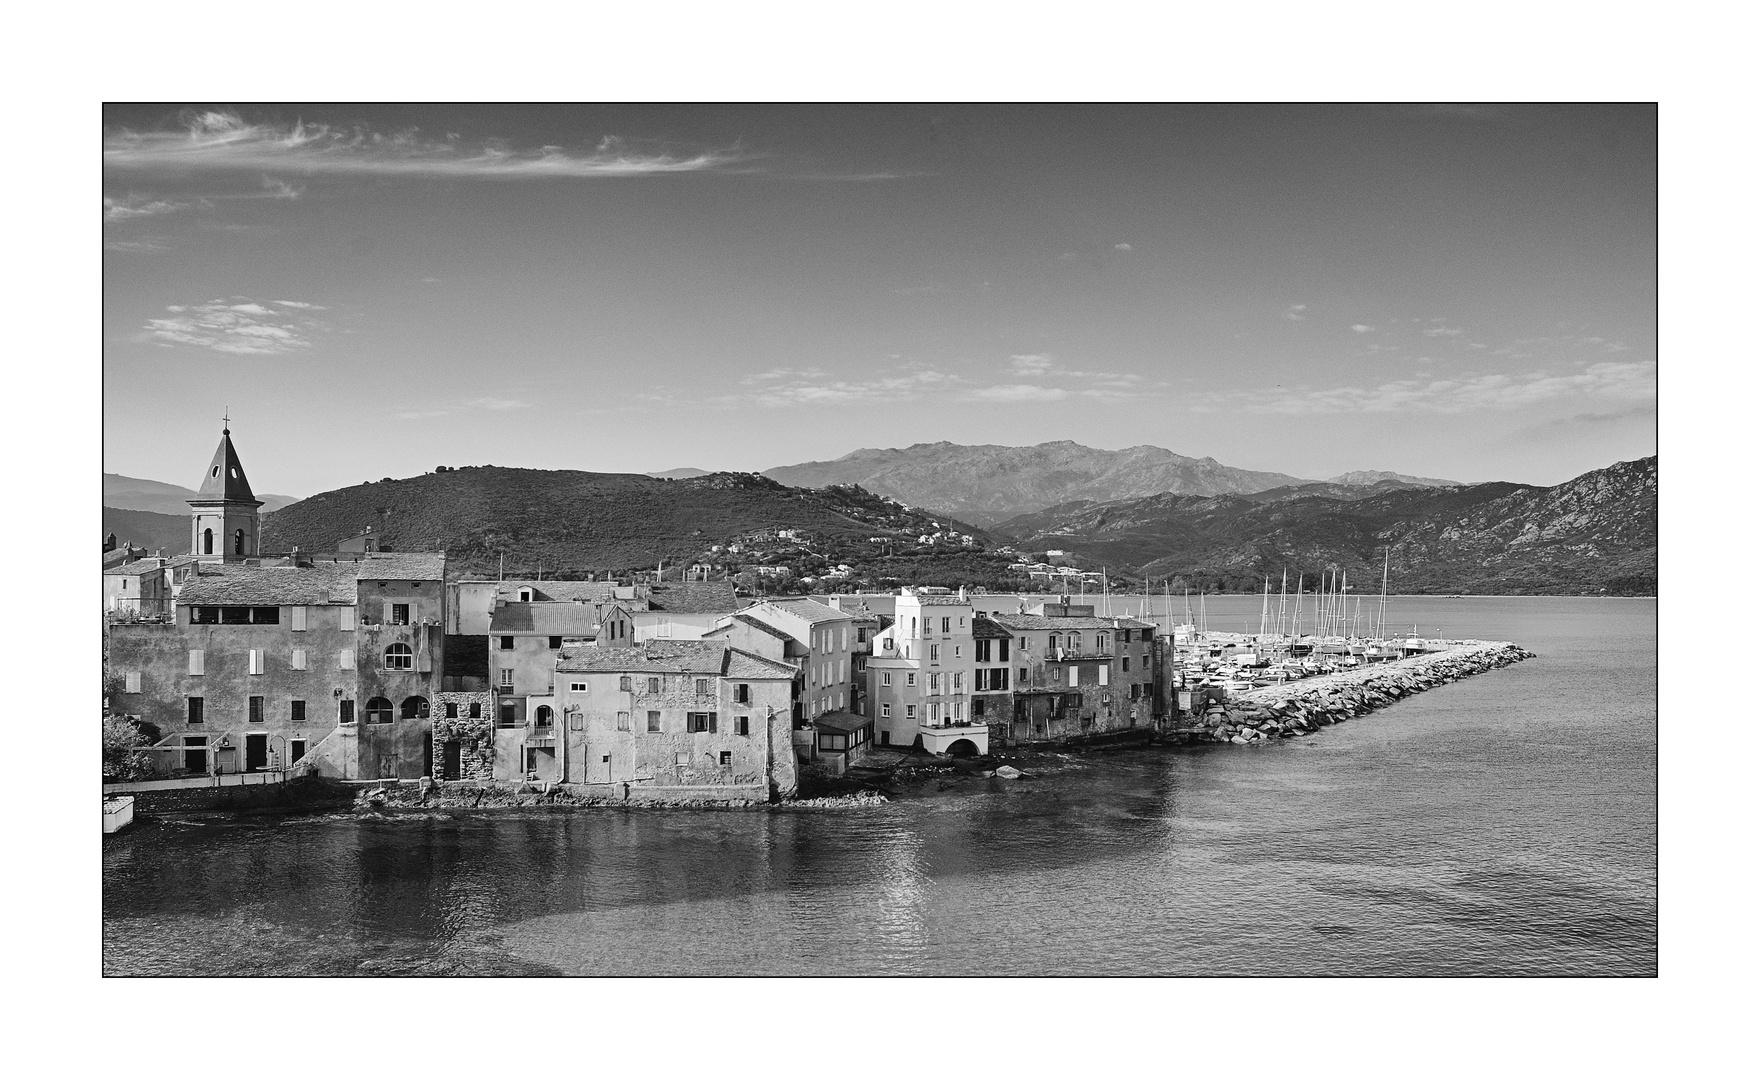 Saint Florent (Korsika)